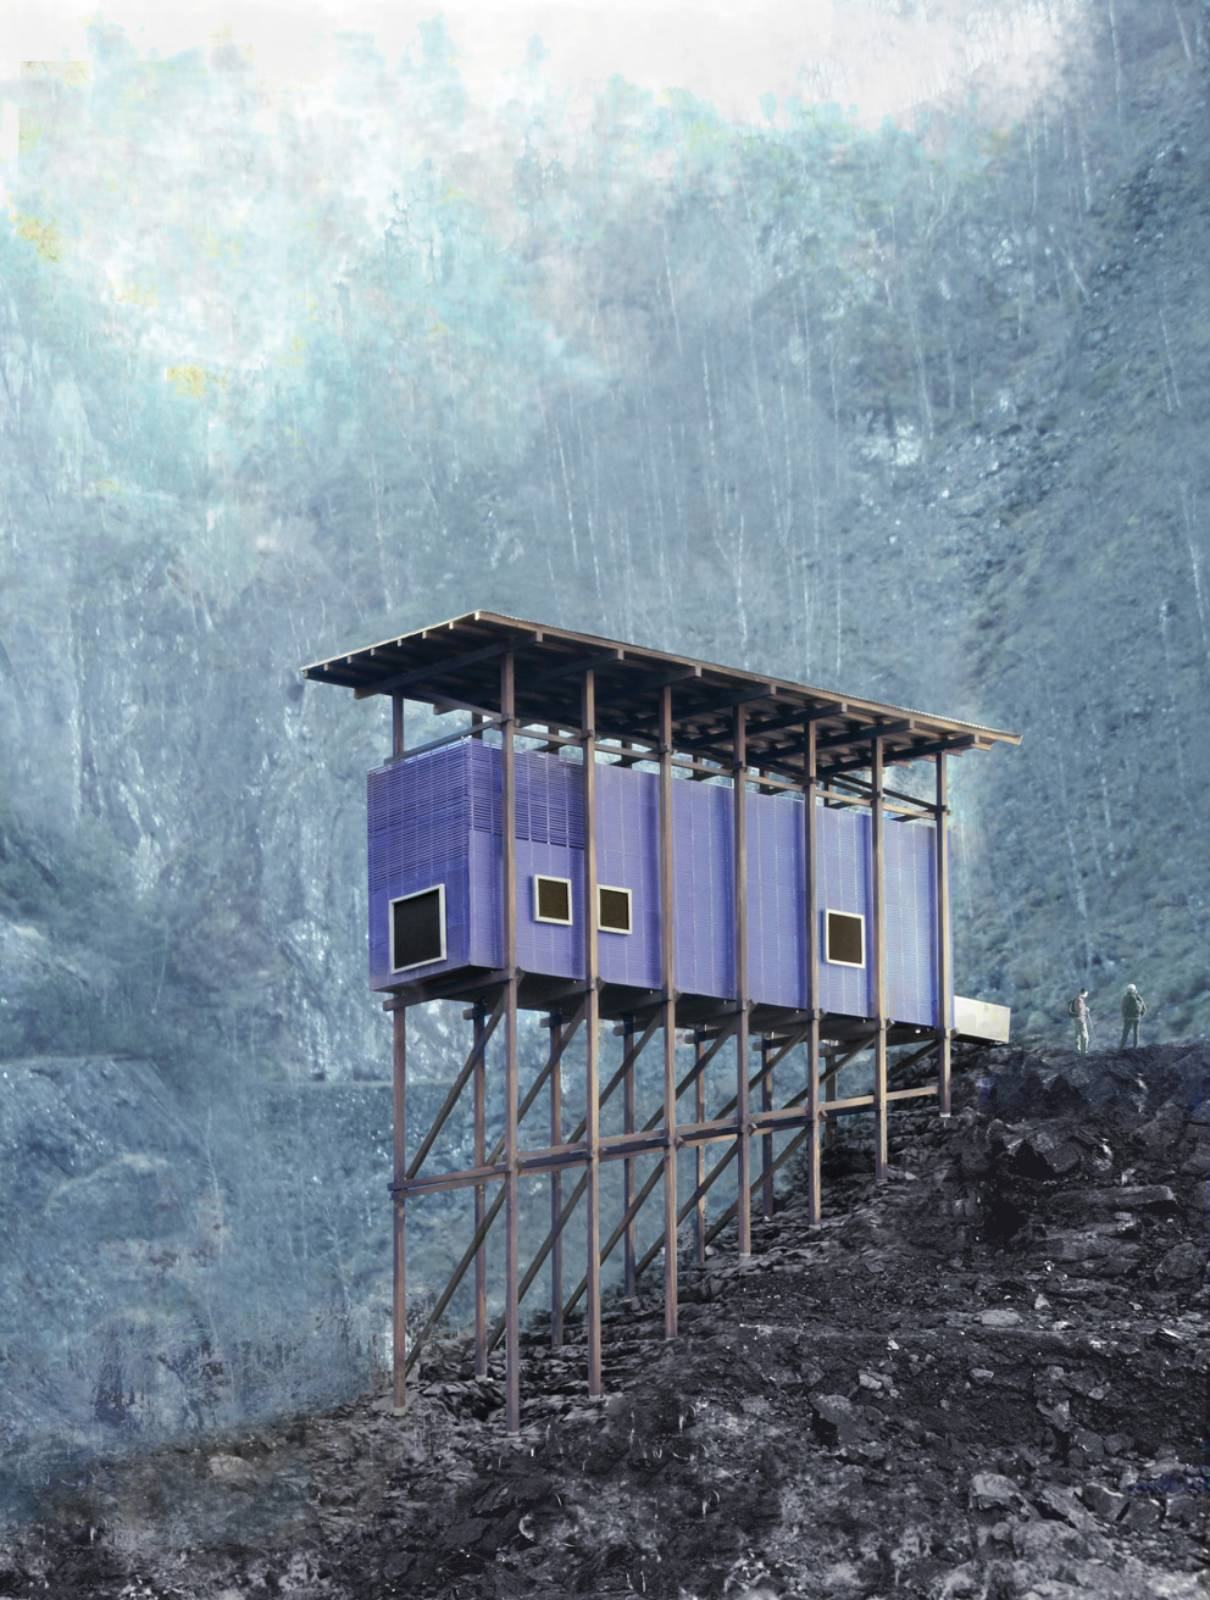 Peter zumthor s zinc mine museum next open in norway 04 for Architecture zinc